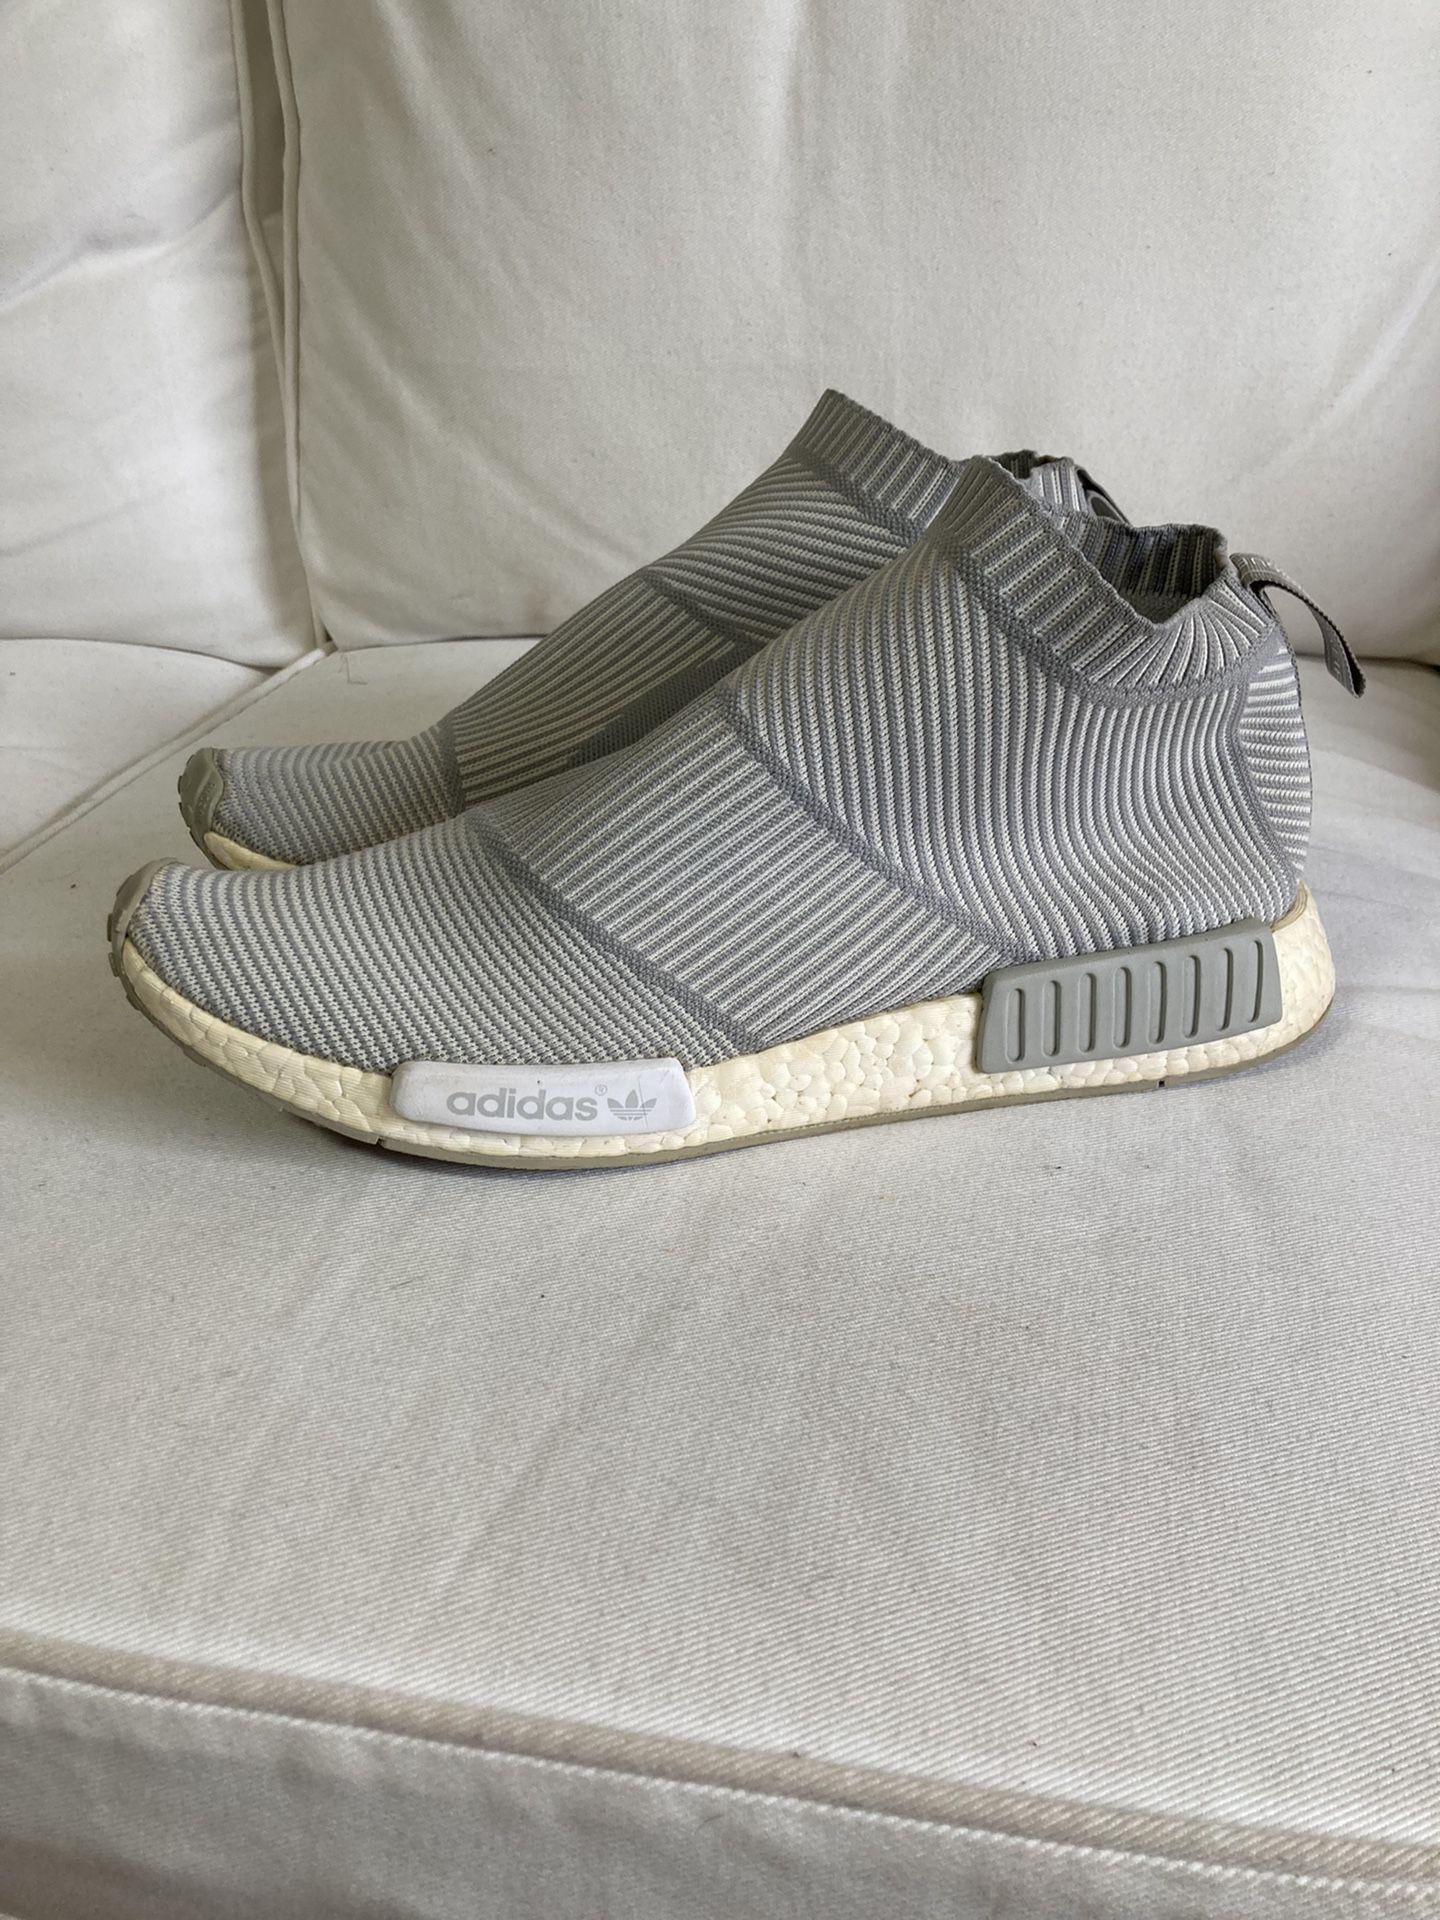 Adidas NMD CS1 Light Grey Size 14 Men City Sock Boost PK Prime knit